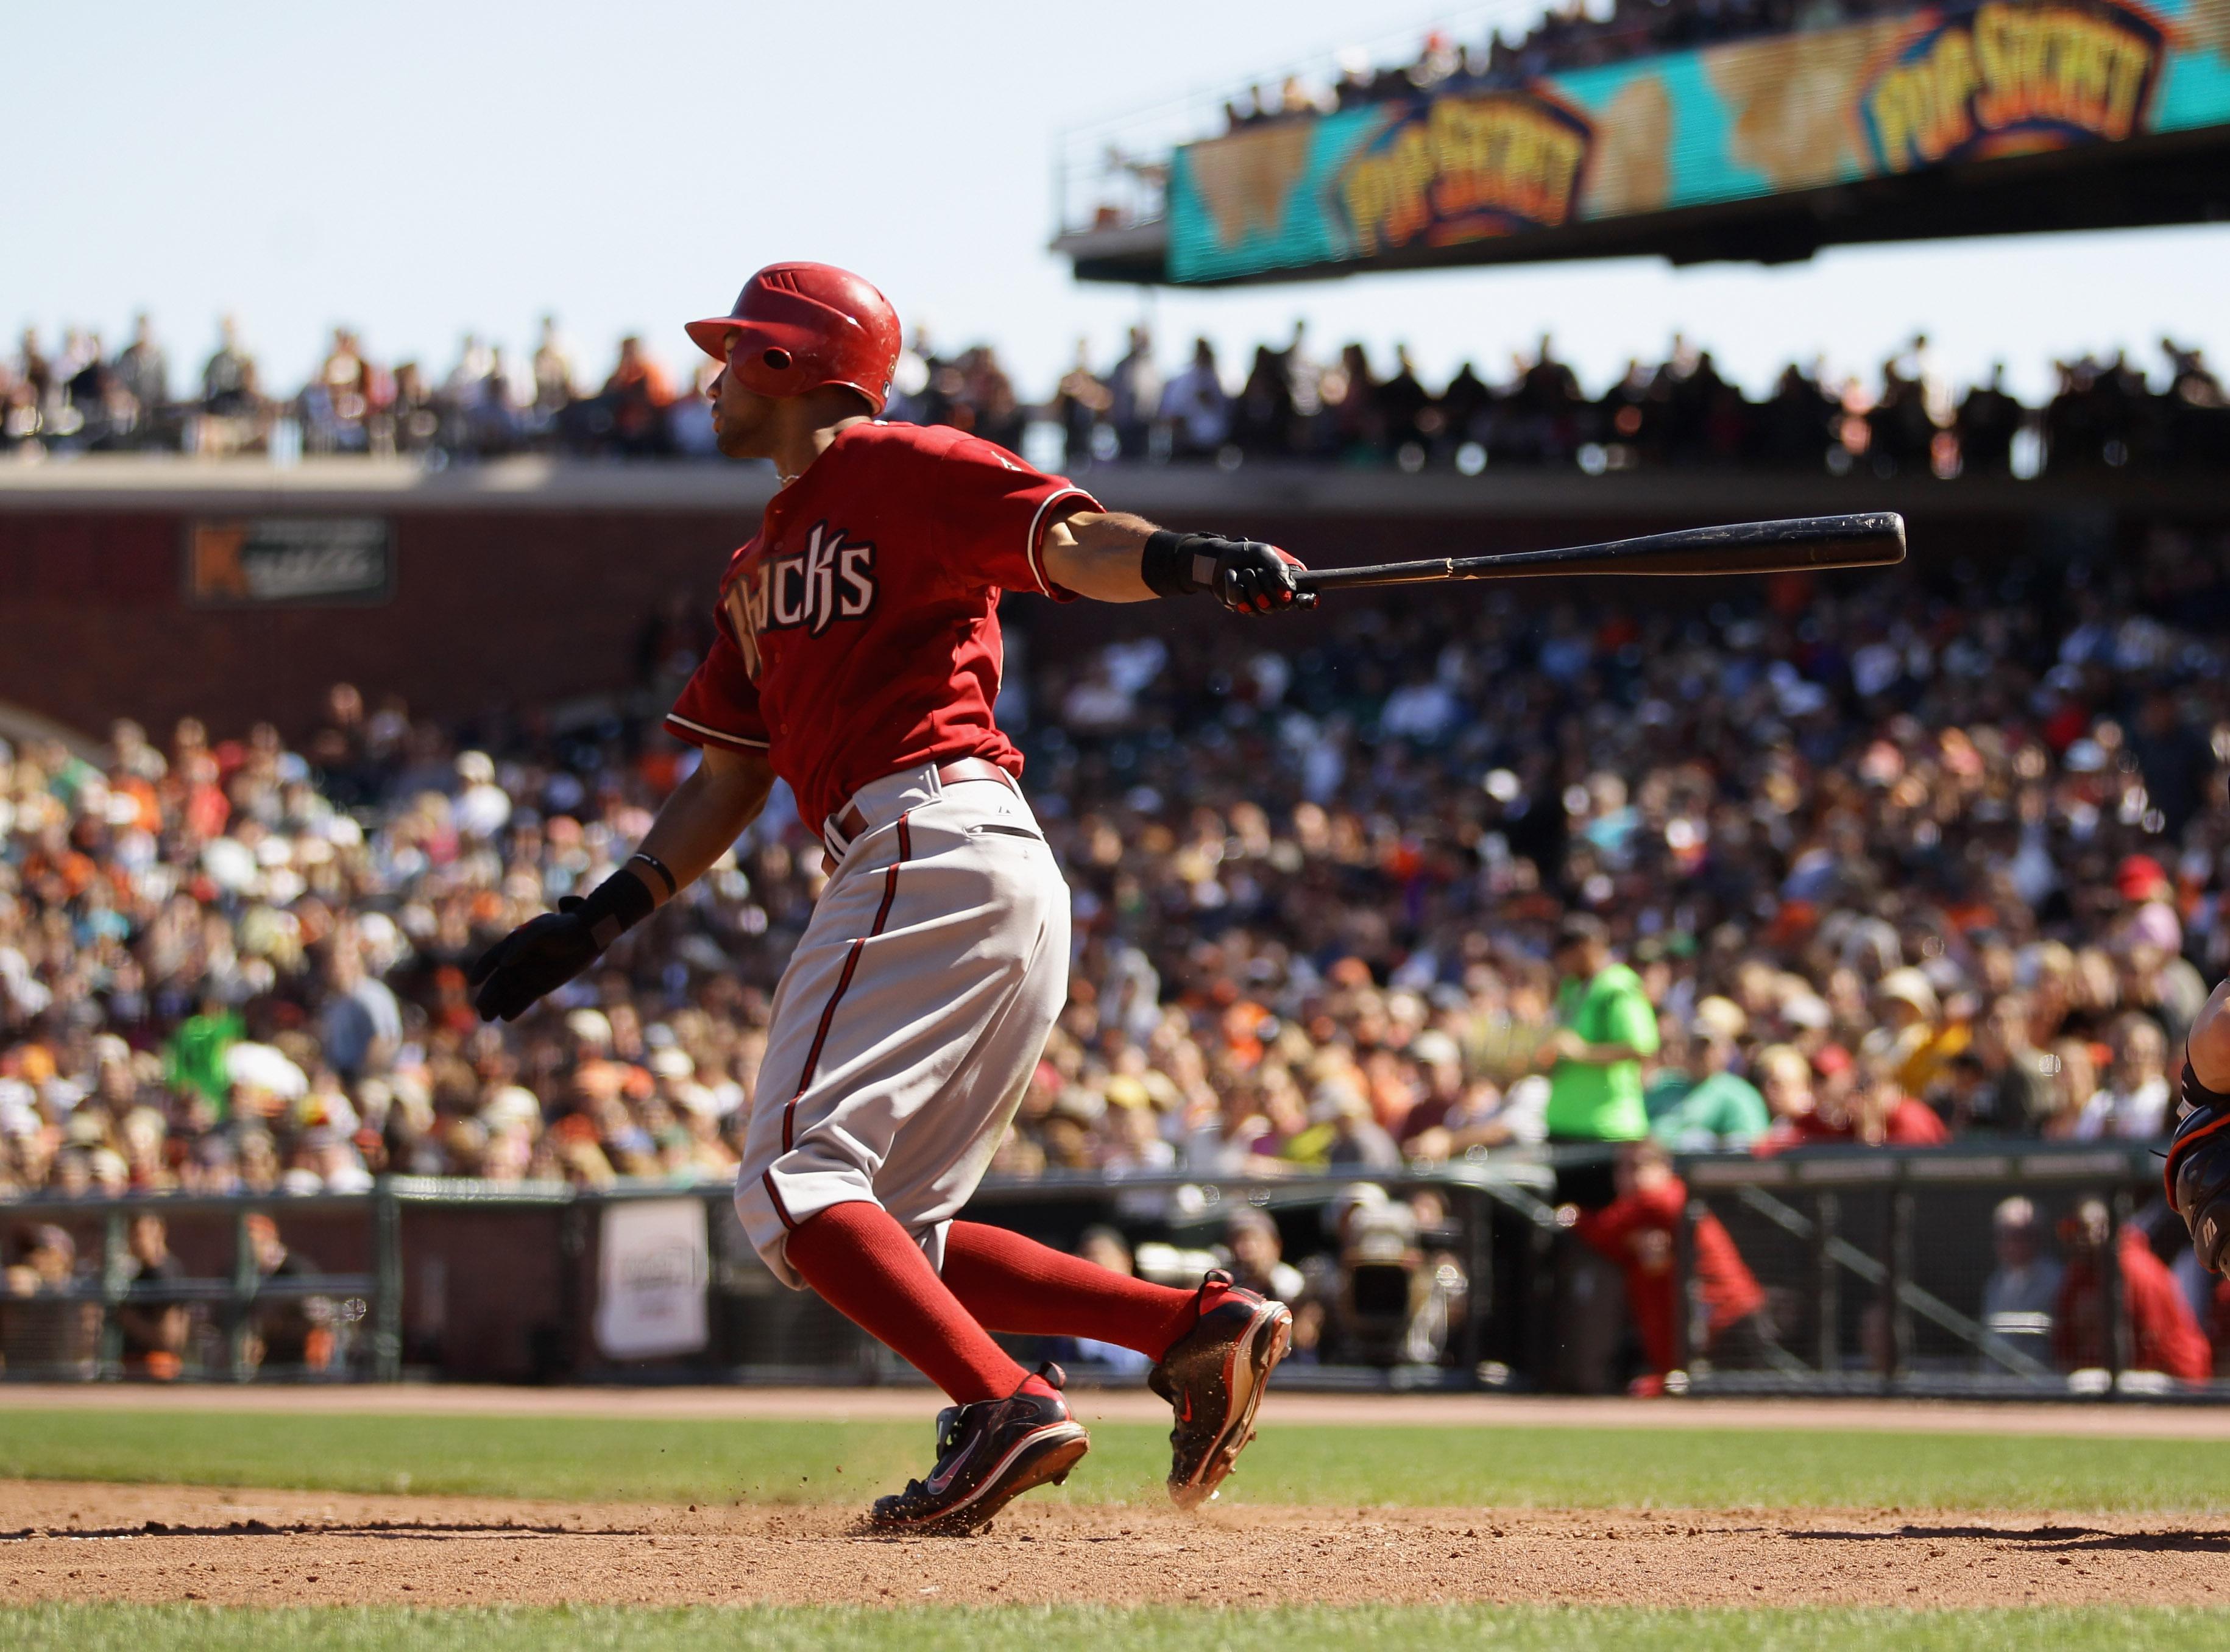 SAN FRANCISCO - AUGUST 29:  Chris Young #24 of the Arizona Diamondbacks bats against the San Francisco Giants at AT&T Park on August 29, 2010 in San Francisco, California.  (Photo by Ezra Shaw/Getty Images)